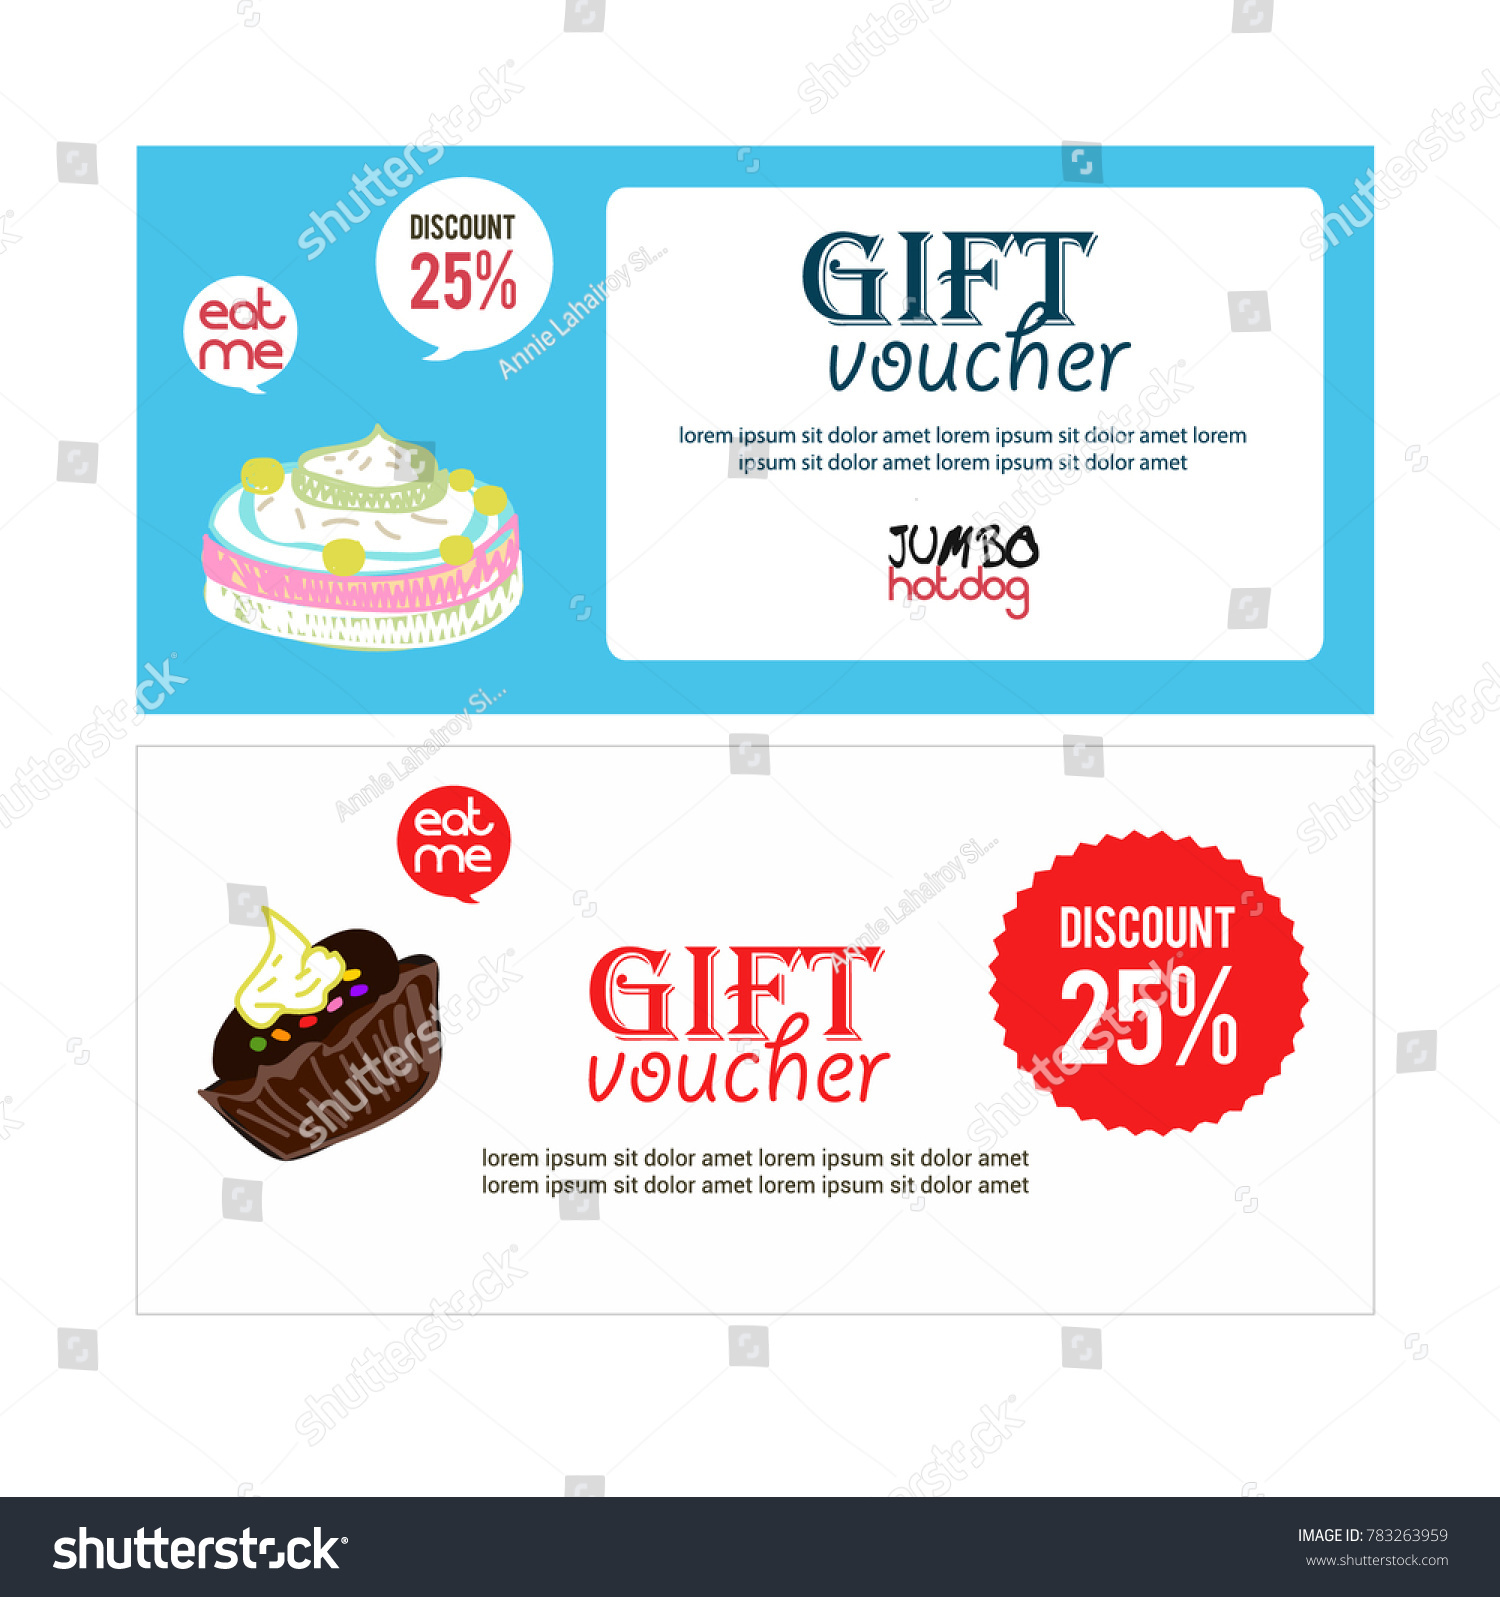 Voucher Gift Bannerposter Coupon Gift Cardposter Stock Vector